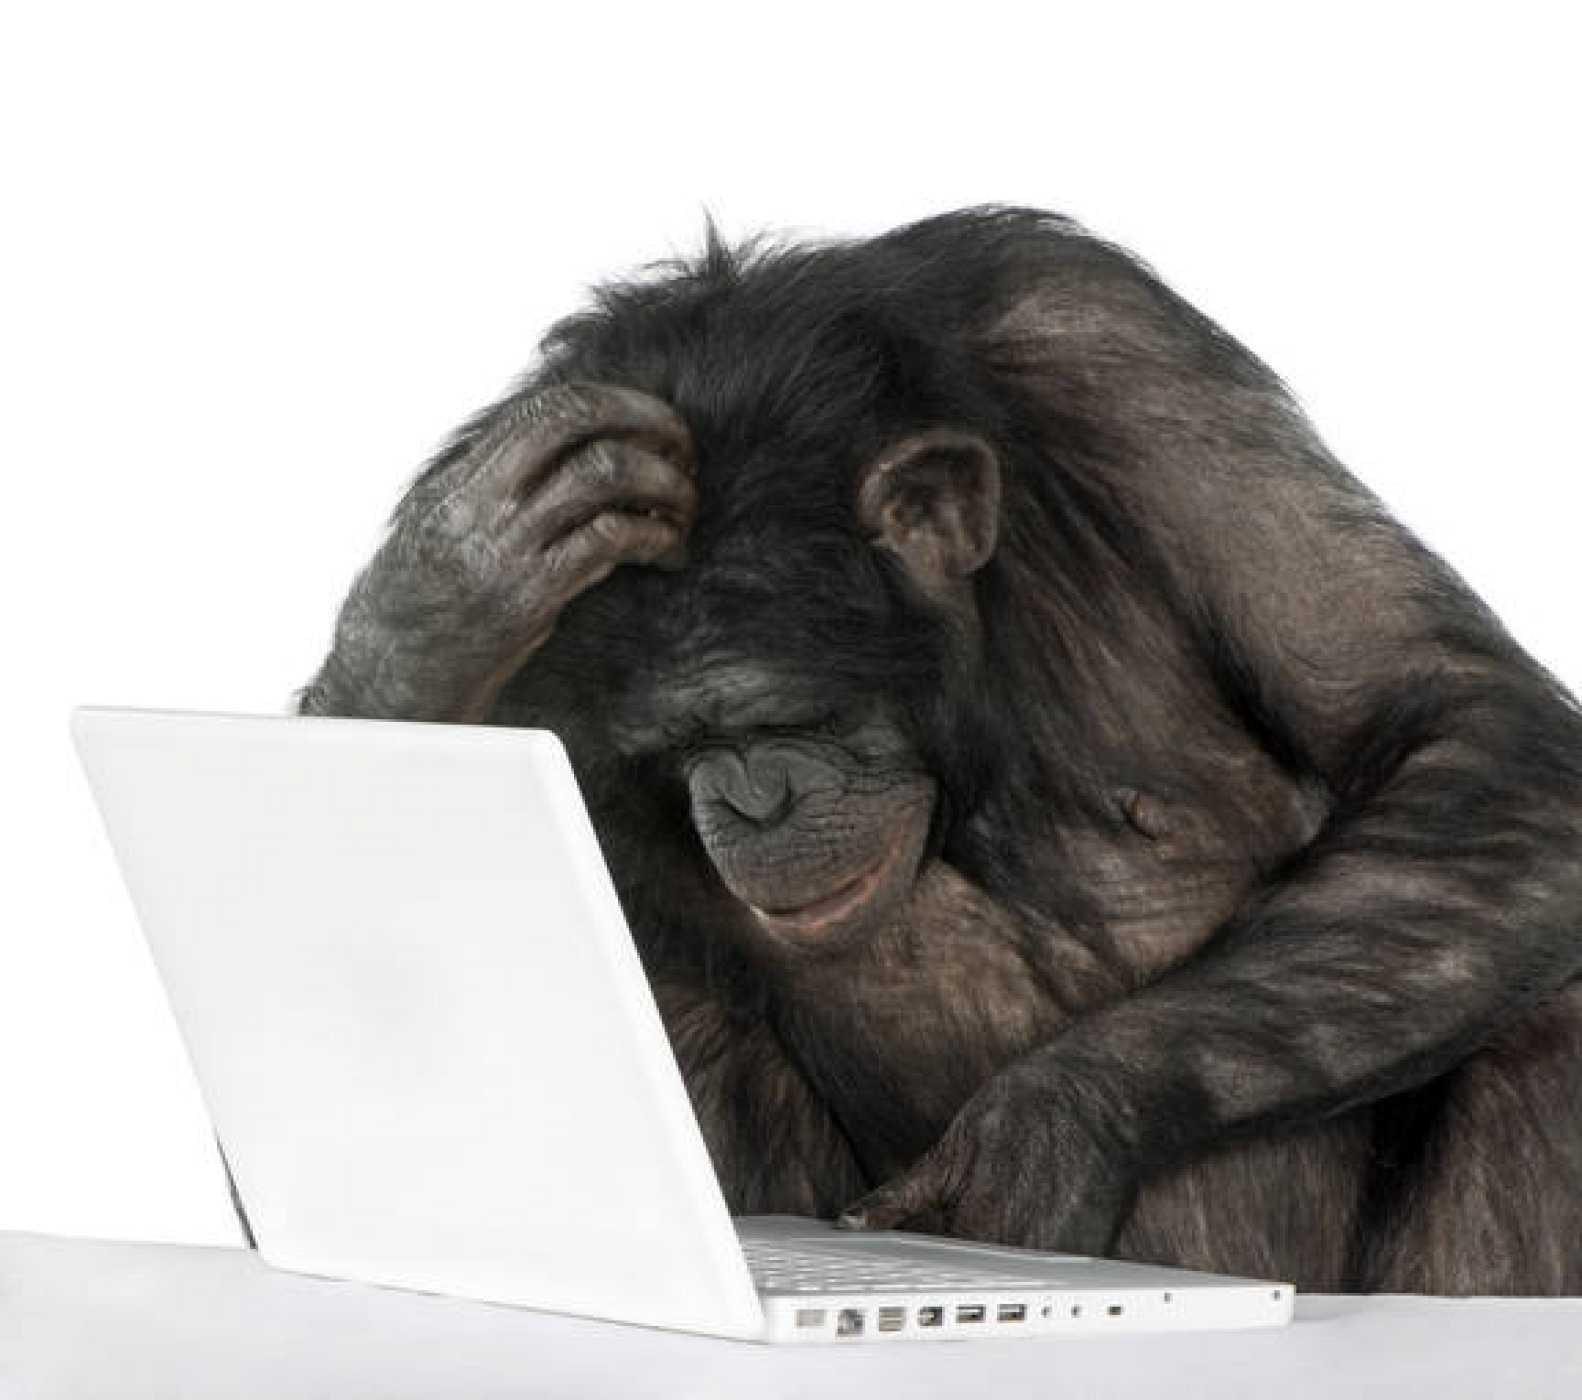 Un experimento con monos virtuales consigue reescribir las obras completas de Shakespeare